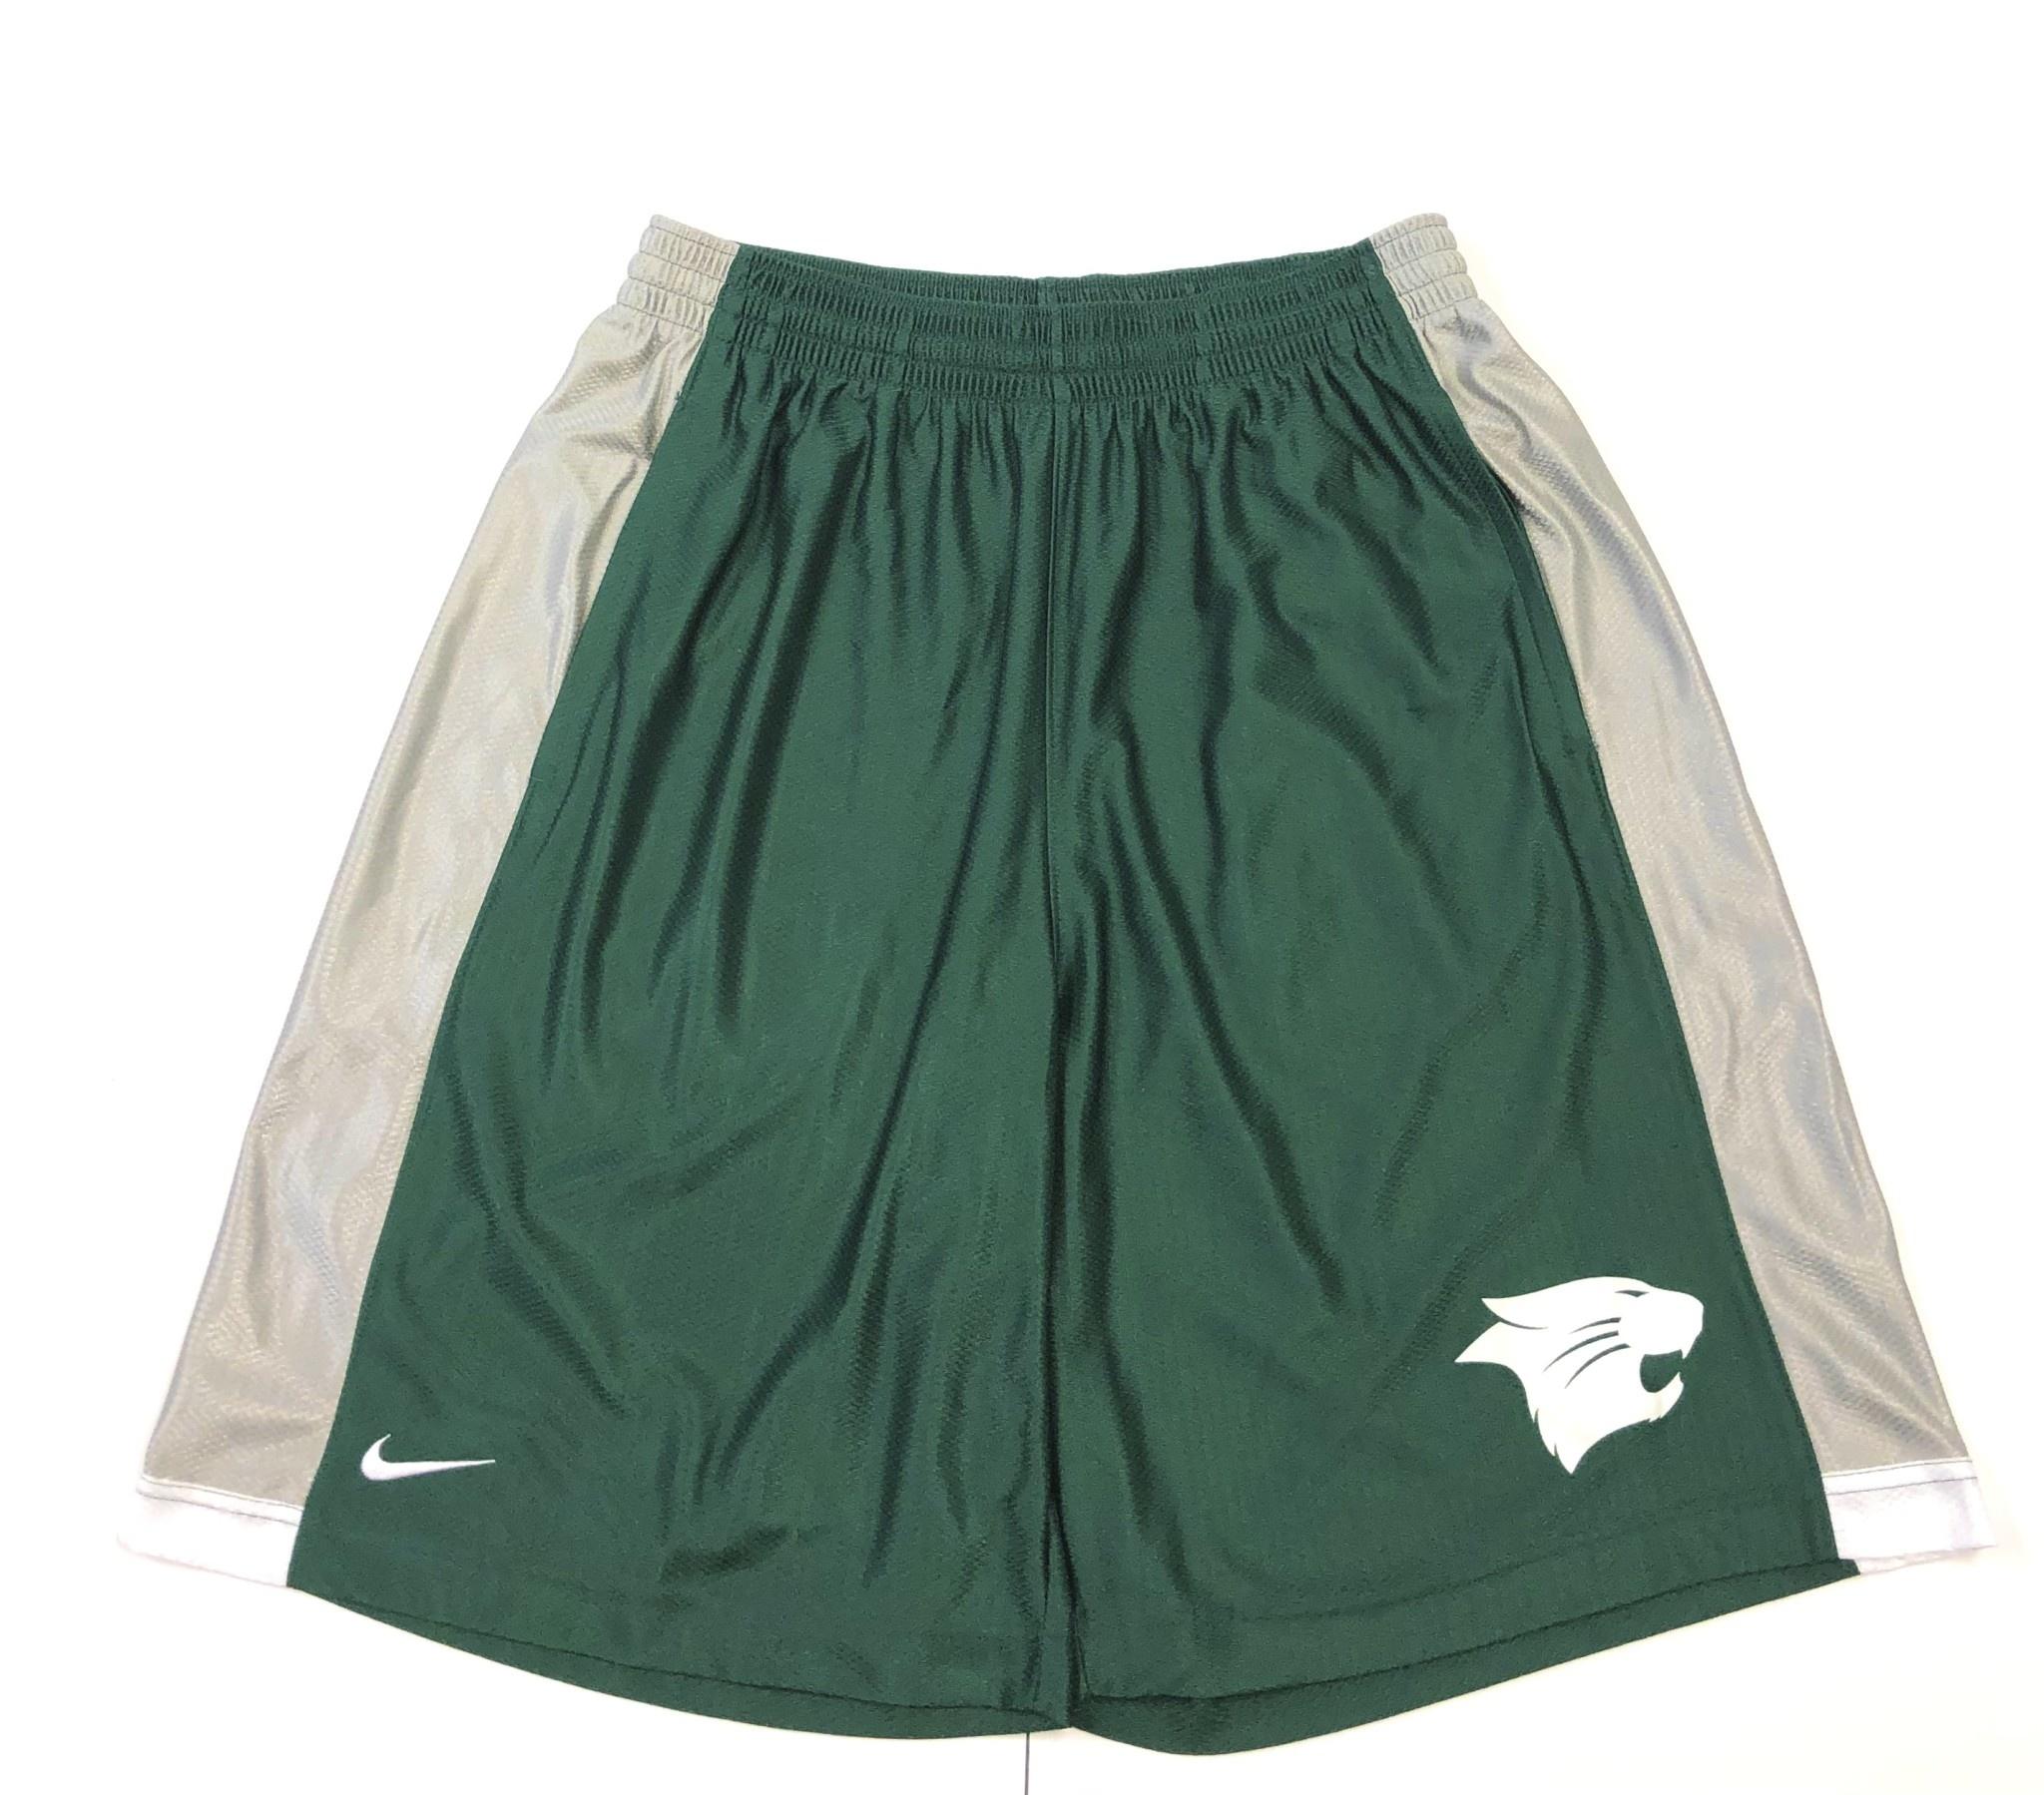 Nike Shorts: Nike Practice Green